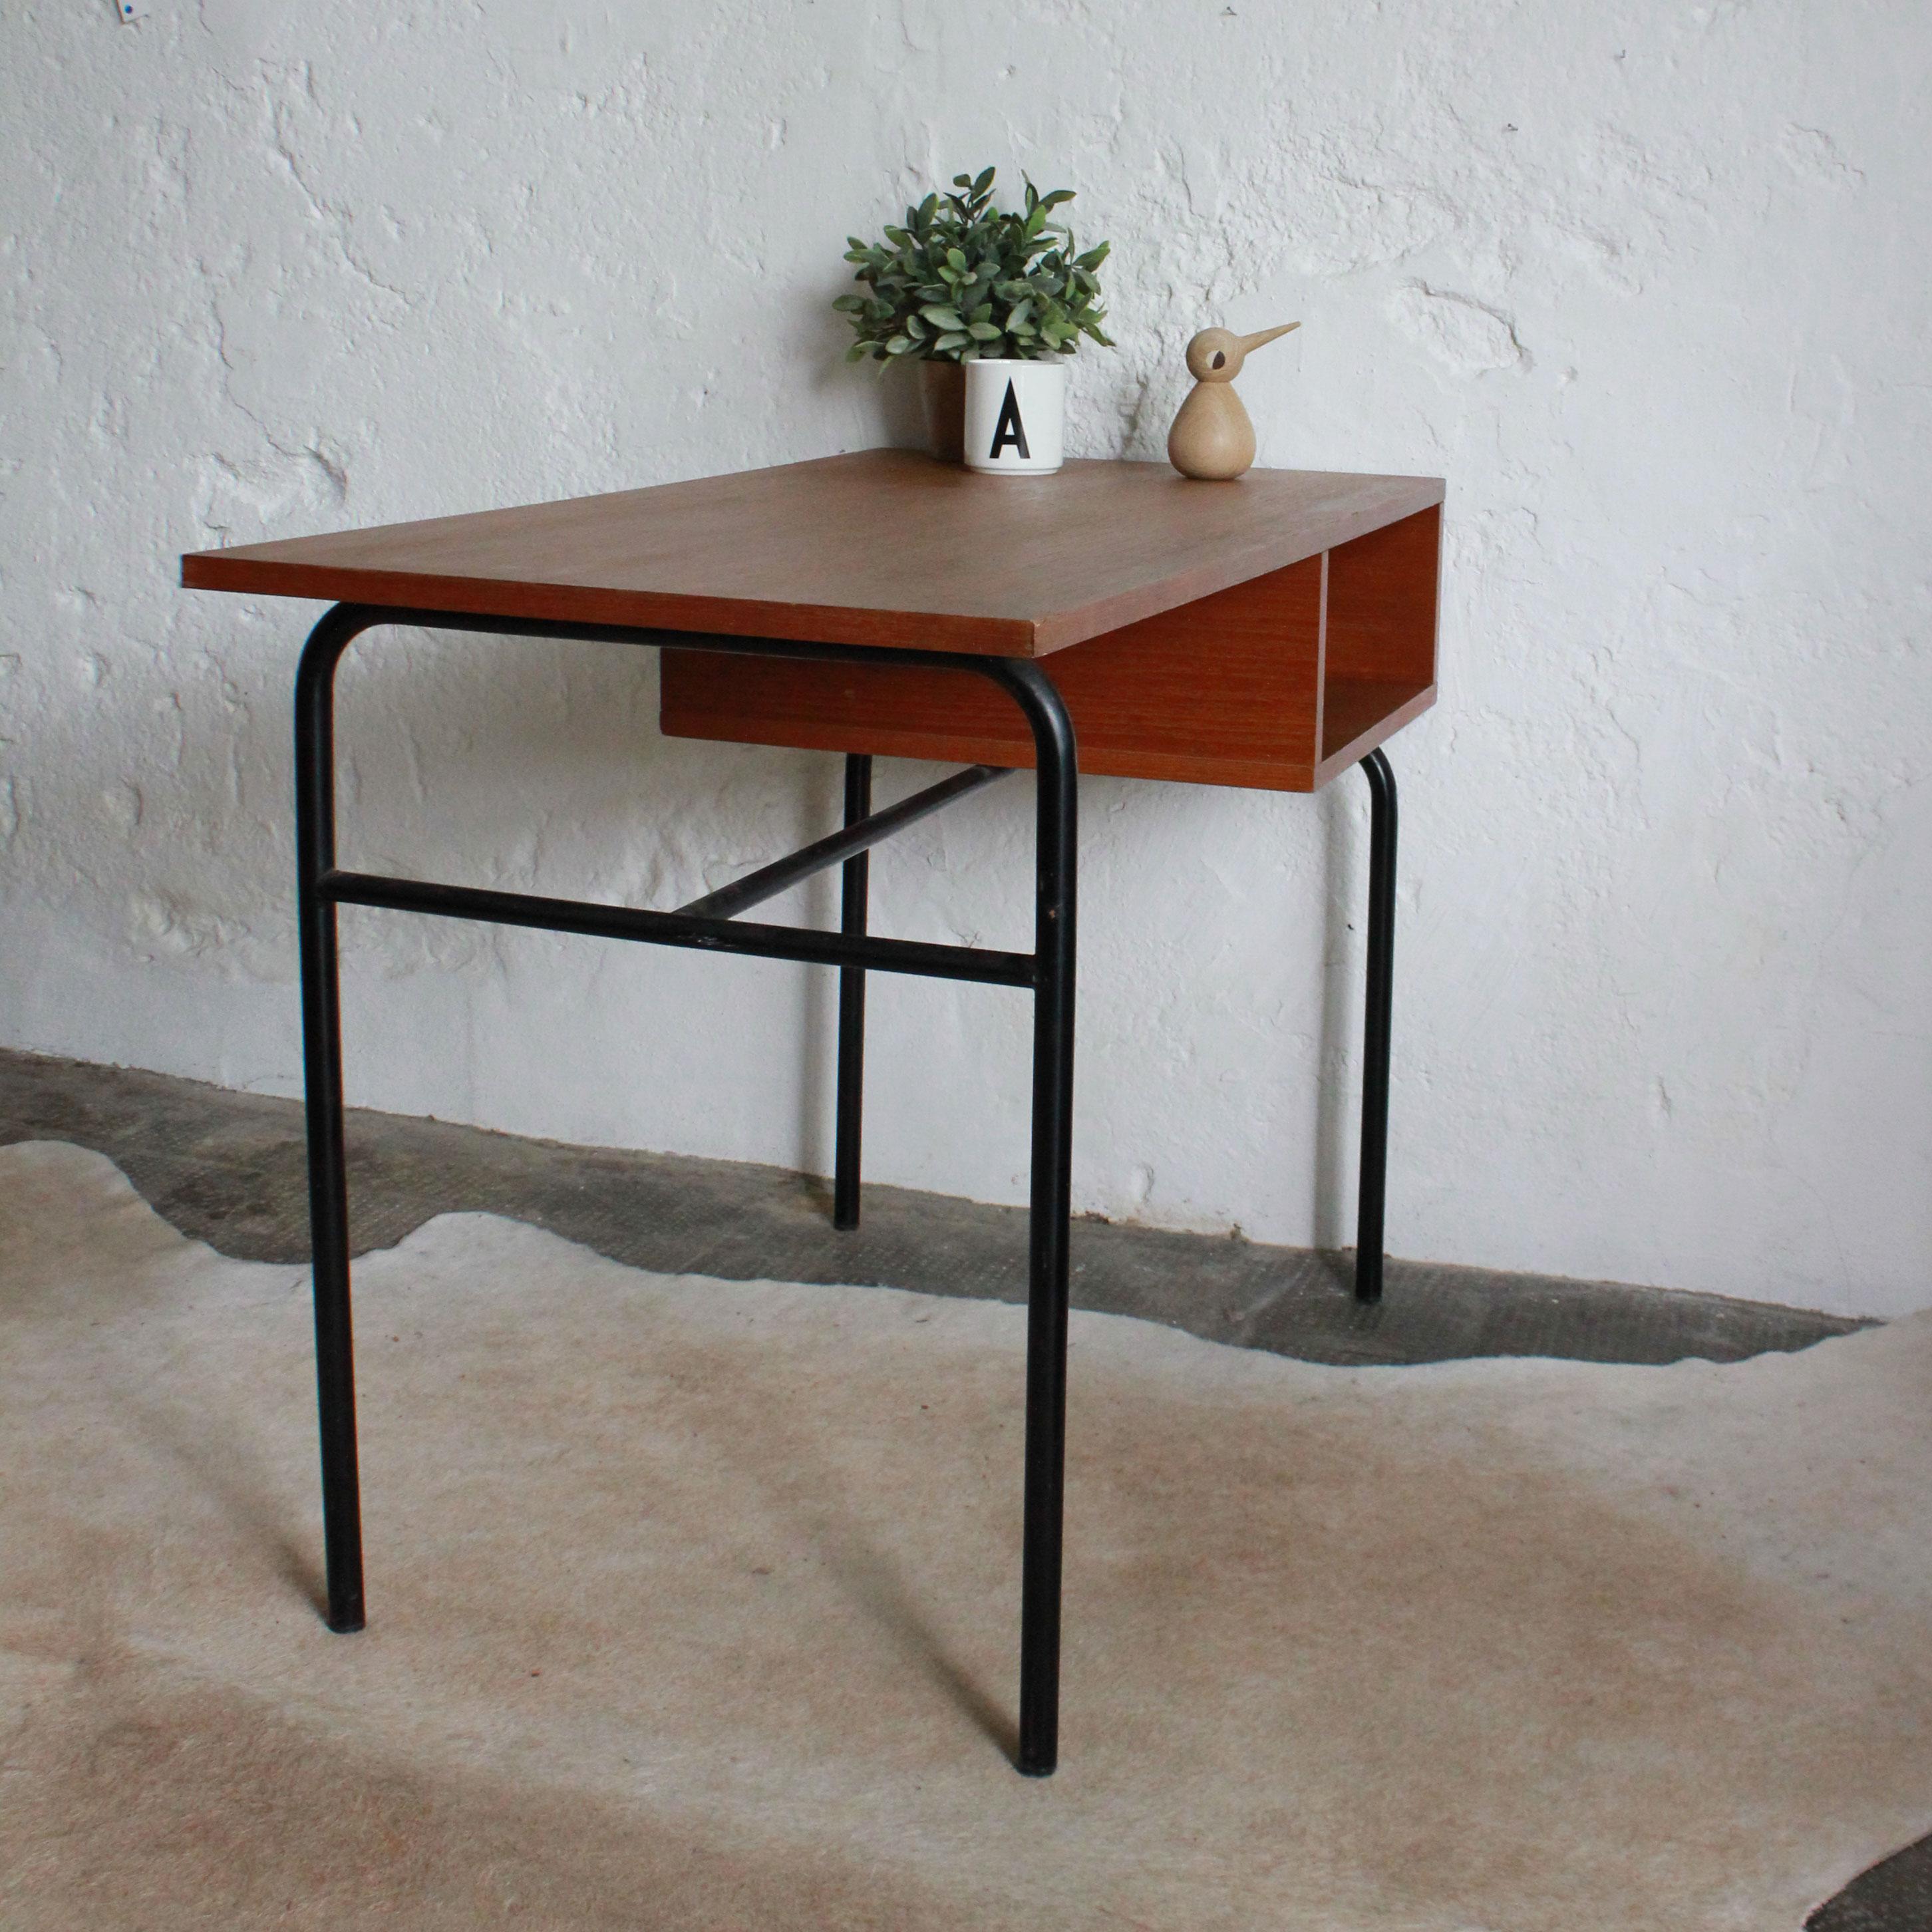 bureau paulin bureau pierre paulin cm 141 galerie yvan royer bureau paulin cm141 dit par. Black Bedroom Furniture Sets. Home Design Ideas